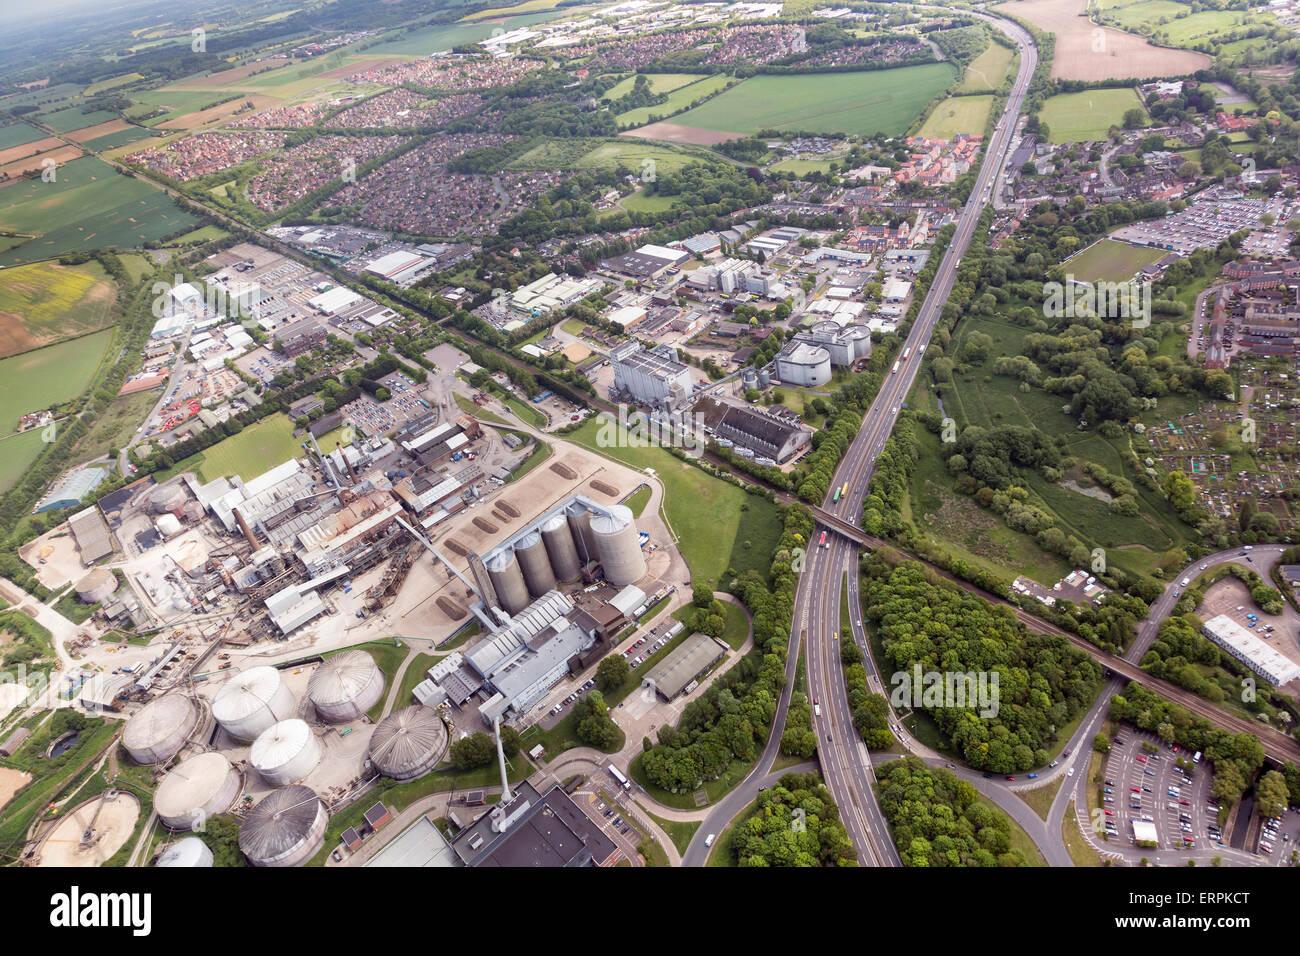 aerial photo of Bury St Edmunds - Stock Image